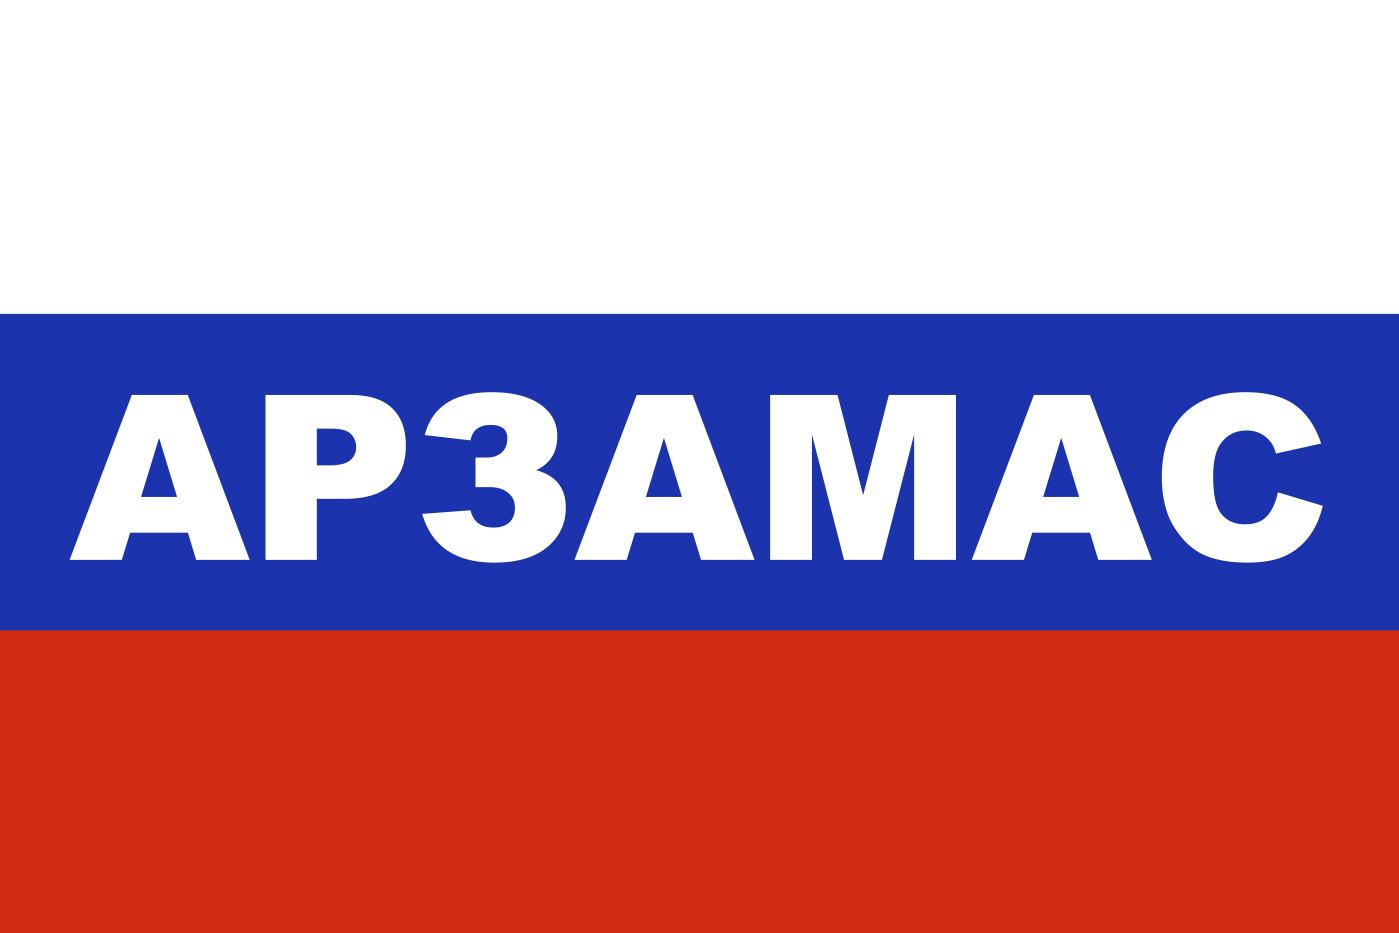 Флаг триколор Арзамас